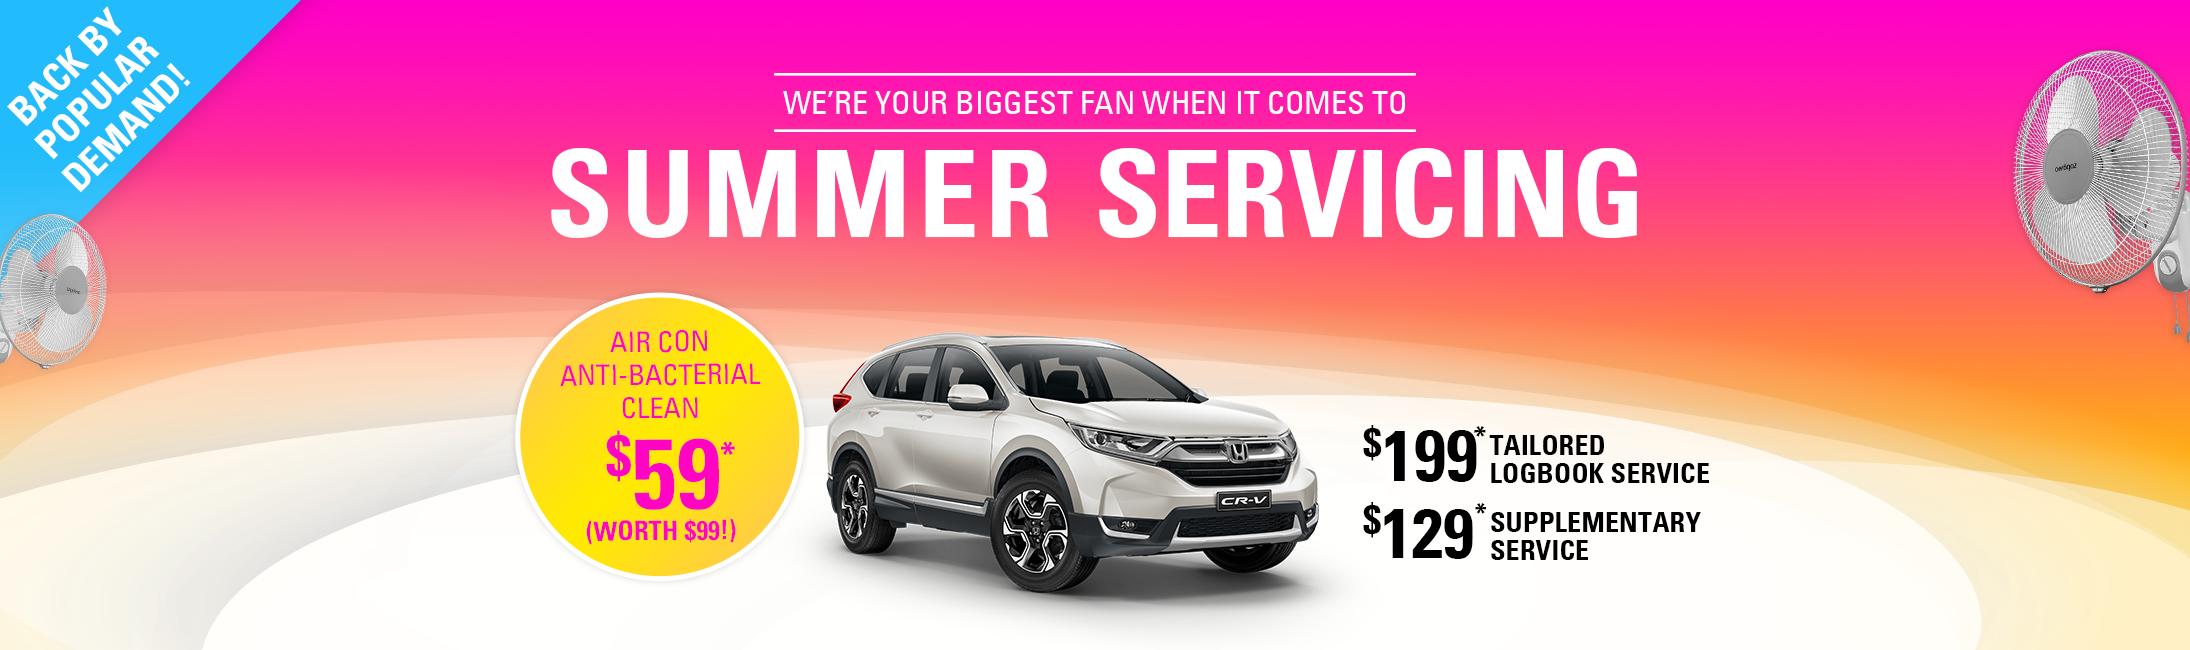 Summer servicing at Prestige Honda.